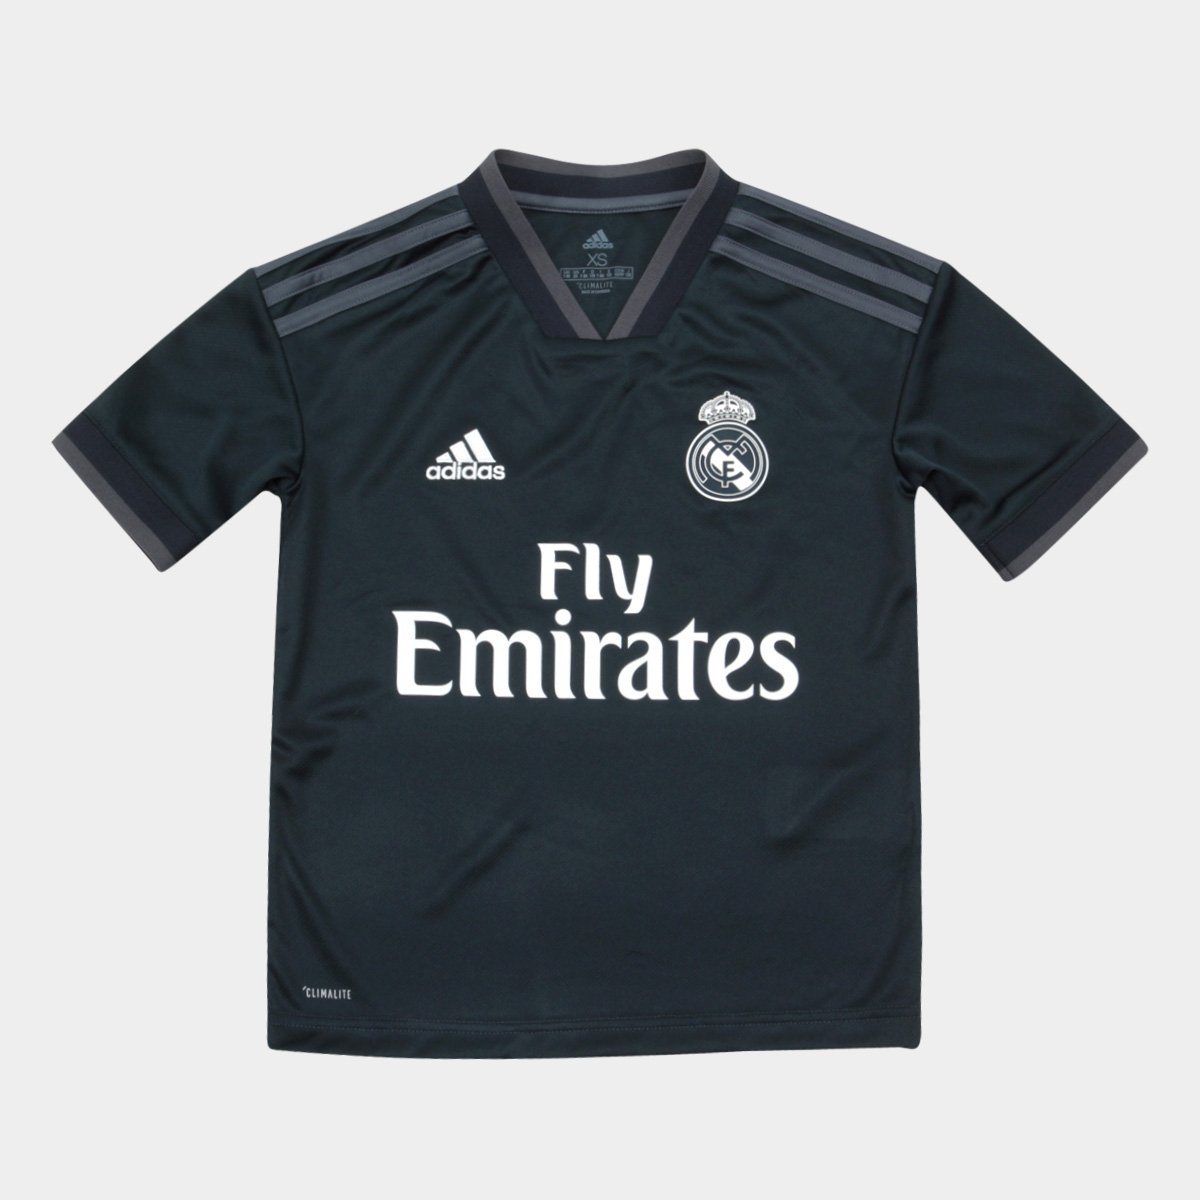 8ece90c5de1 Camisa Real Madrid Infantil Away 2018 s n° Torcedor Adidas - Azul Escuro -  Compre Agora